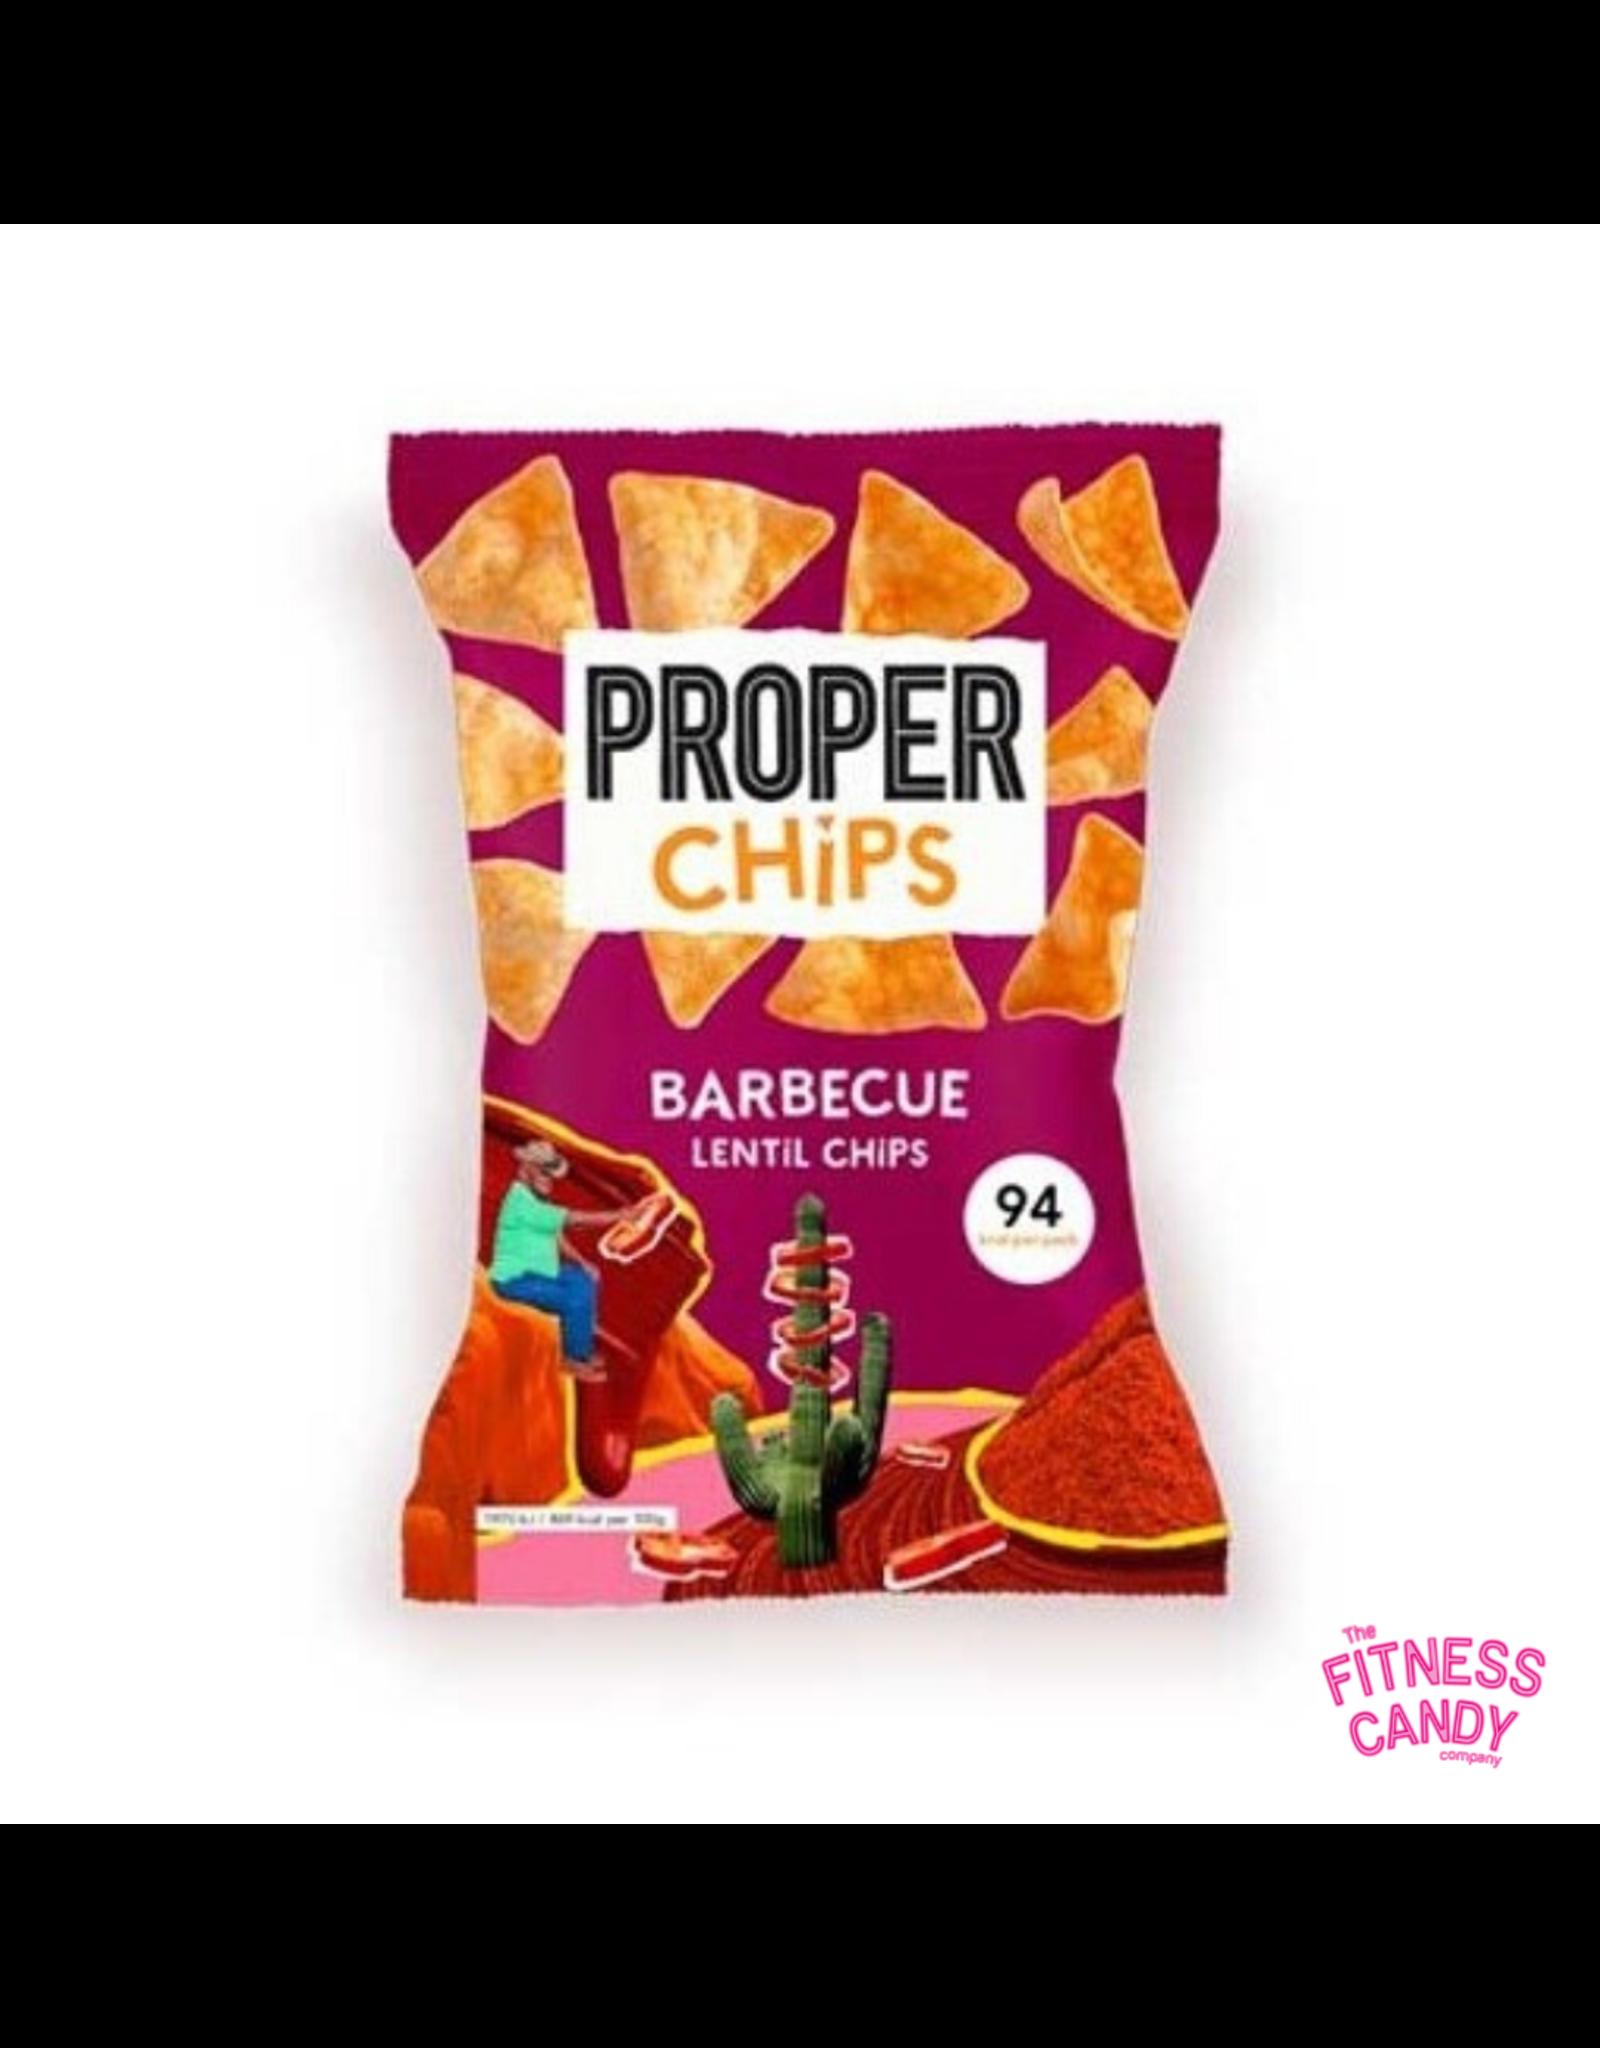 PROPER PROPER CHIPS Barbecue